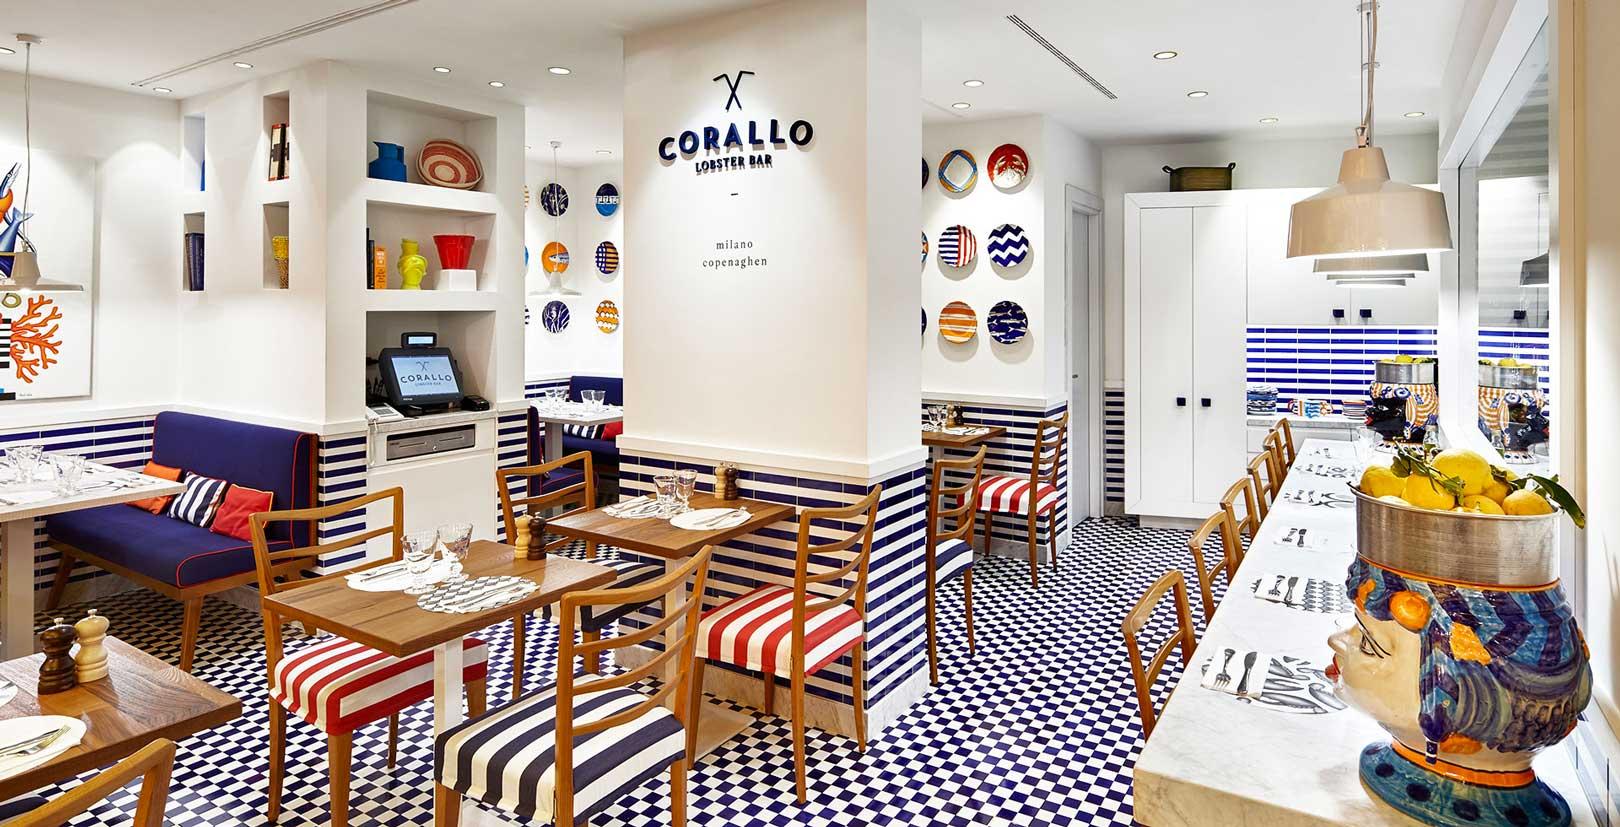 corallo-lobster-bar-cover-ok